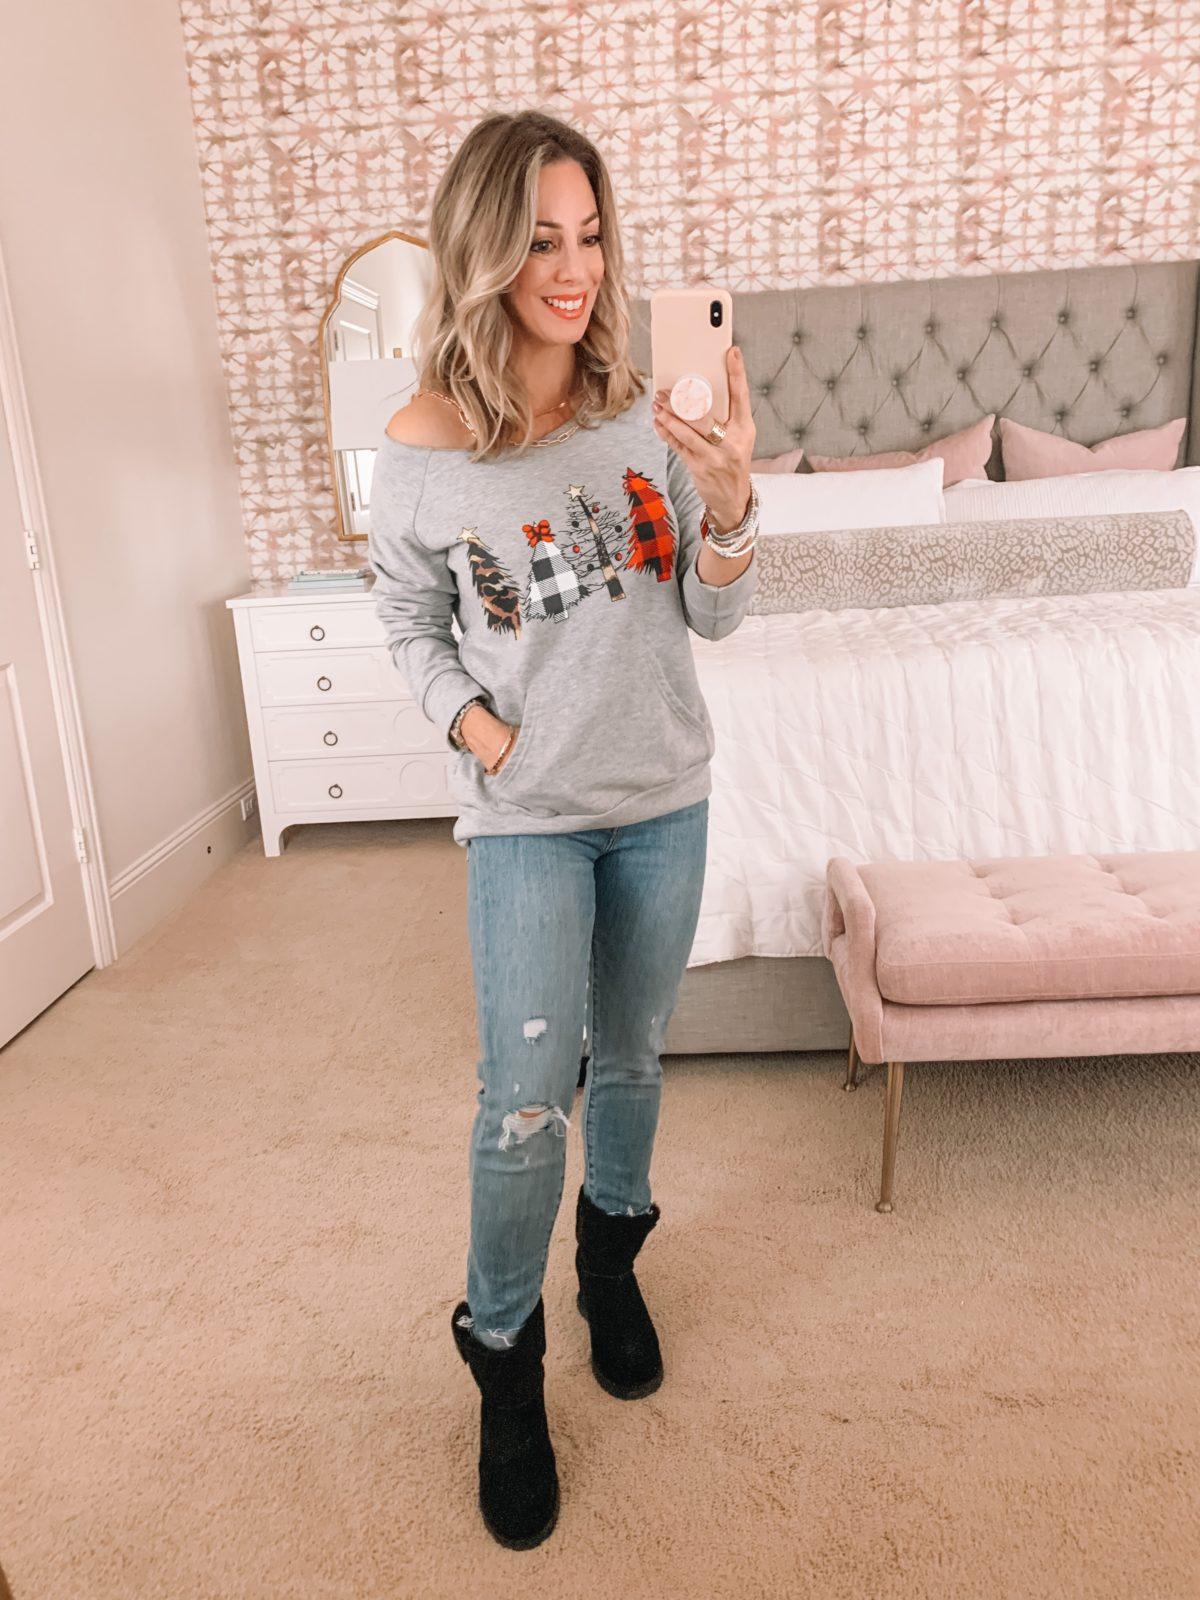 Amazon Fashion Faves, Christmas Tree Sweatshirt, Jeans, Ugg Booties